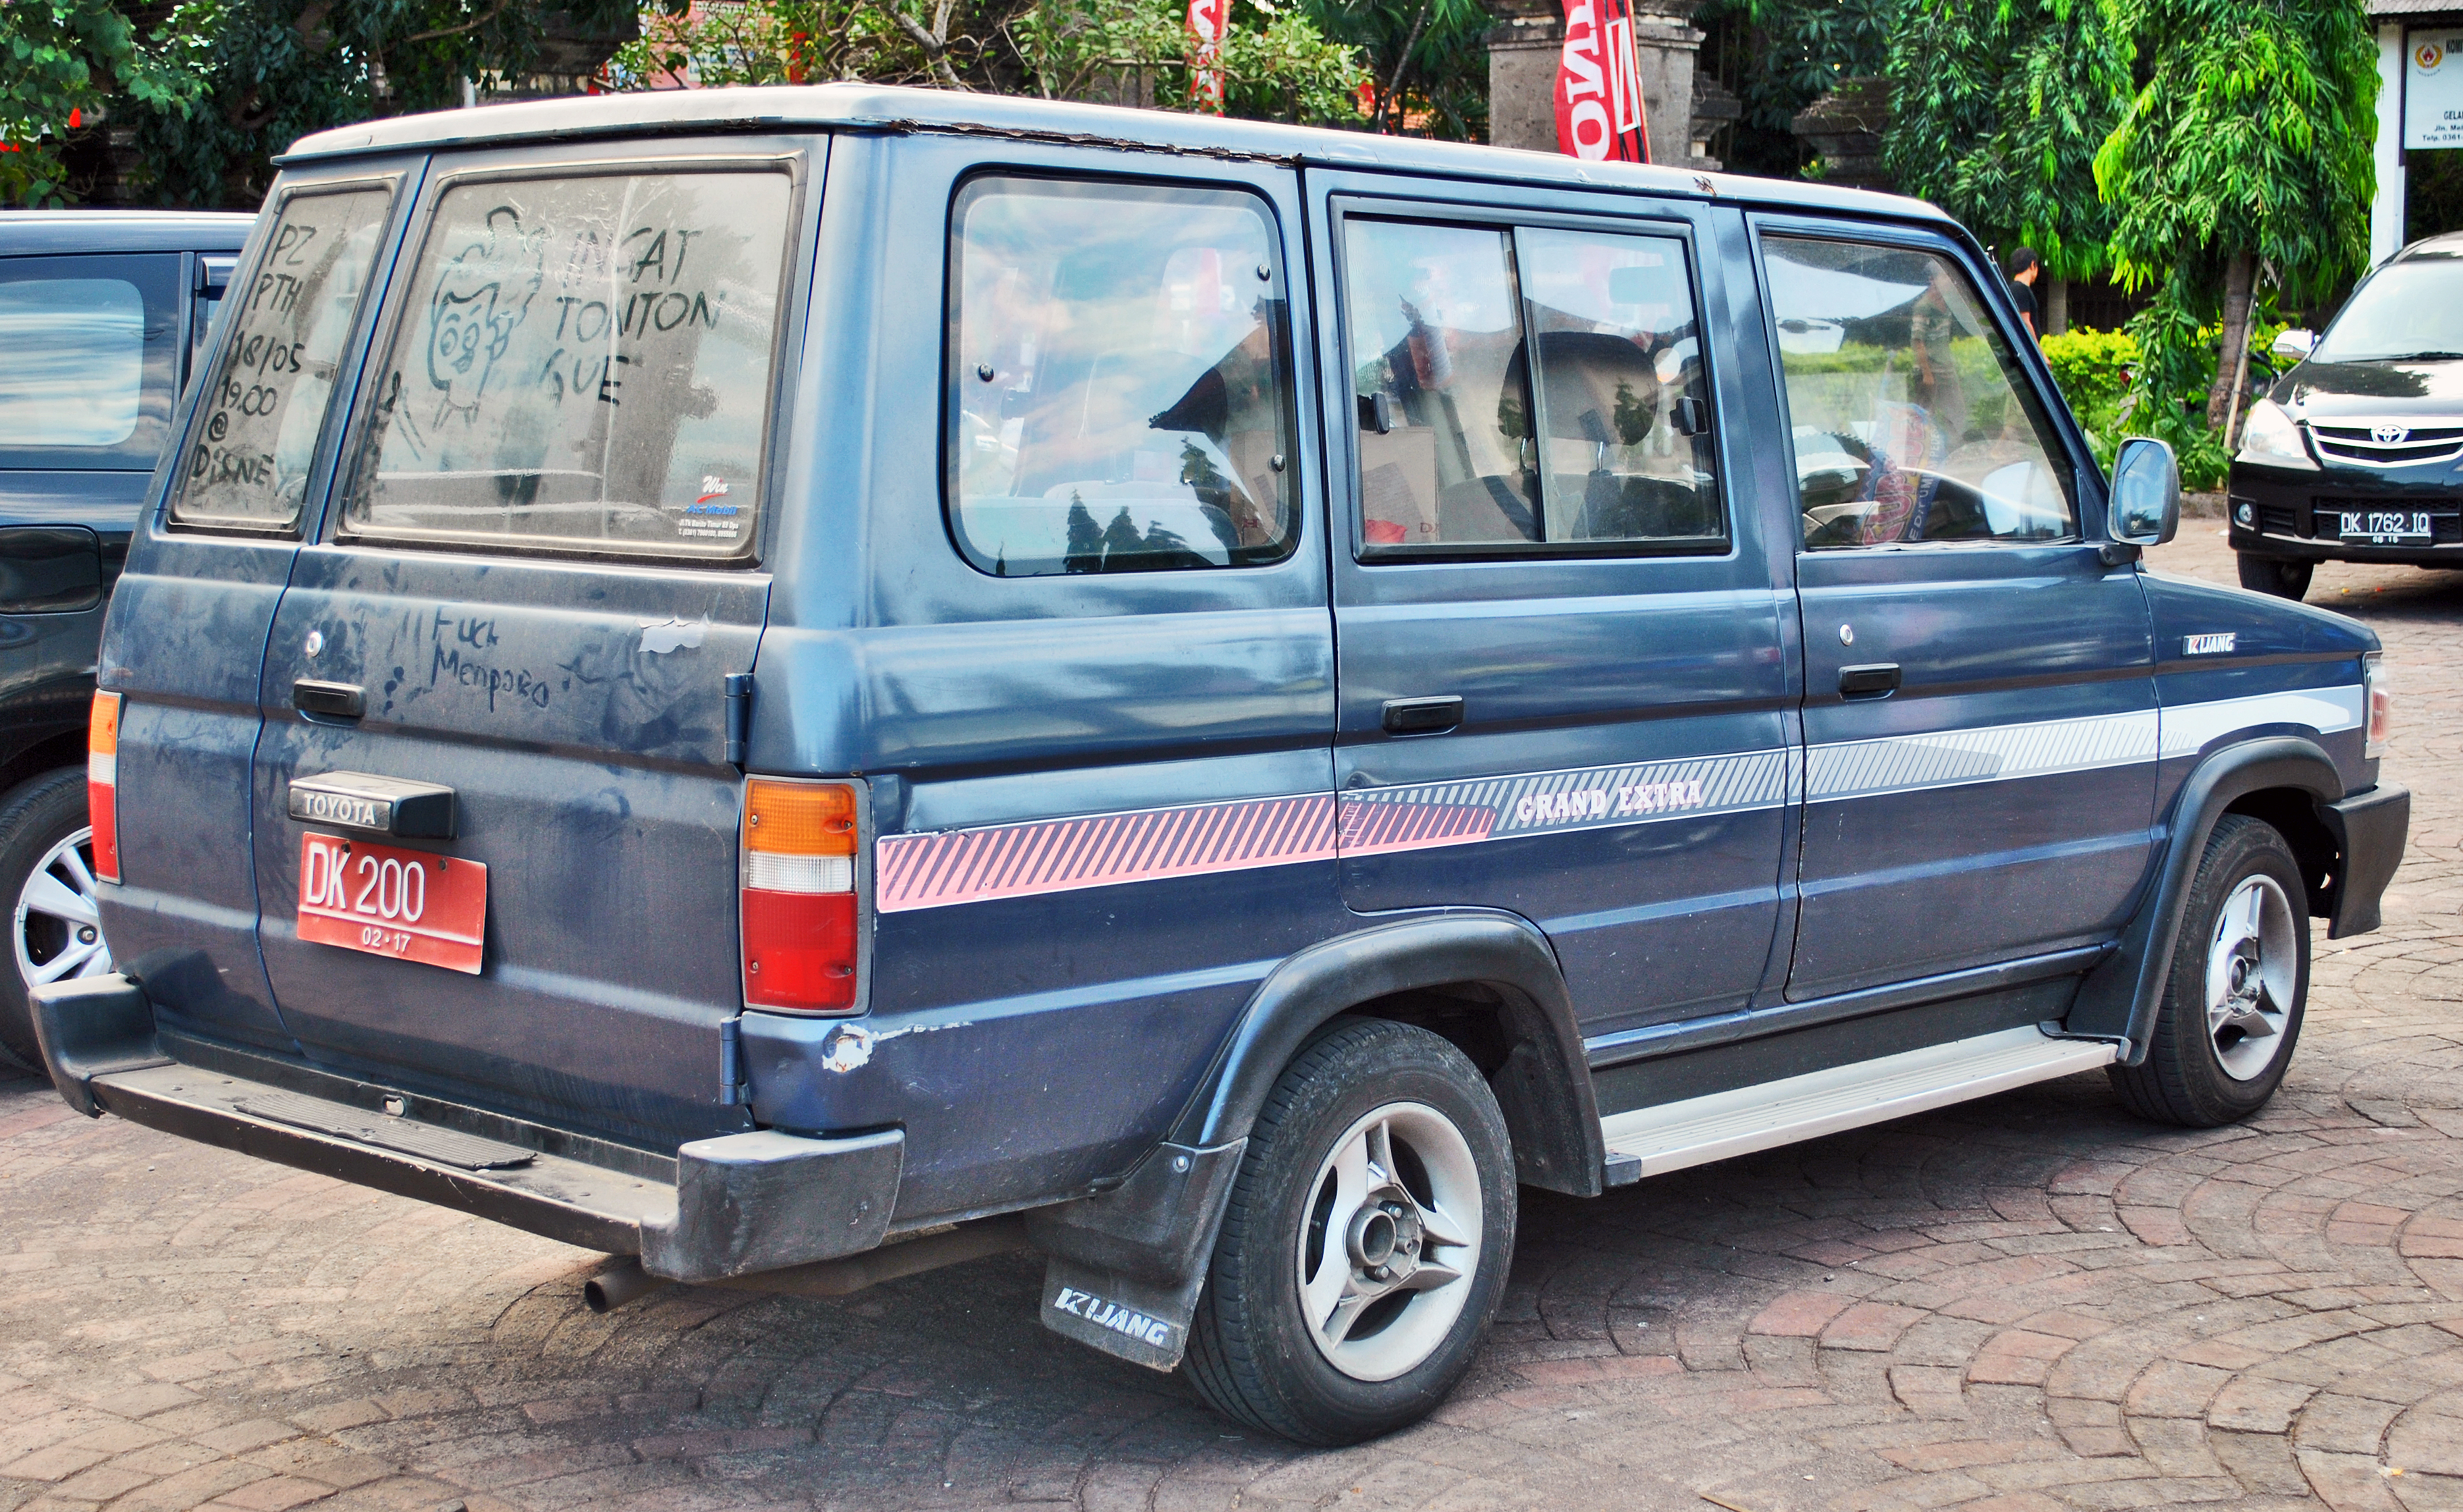 Mobil Bekas Di Bali 2015 – MobilSecond.Info